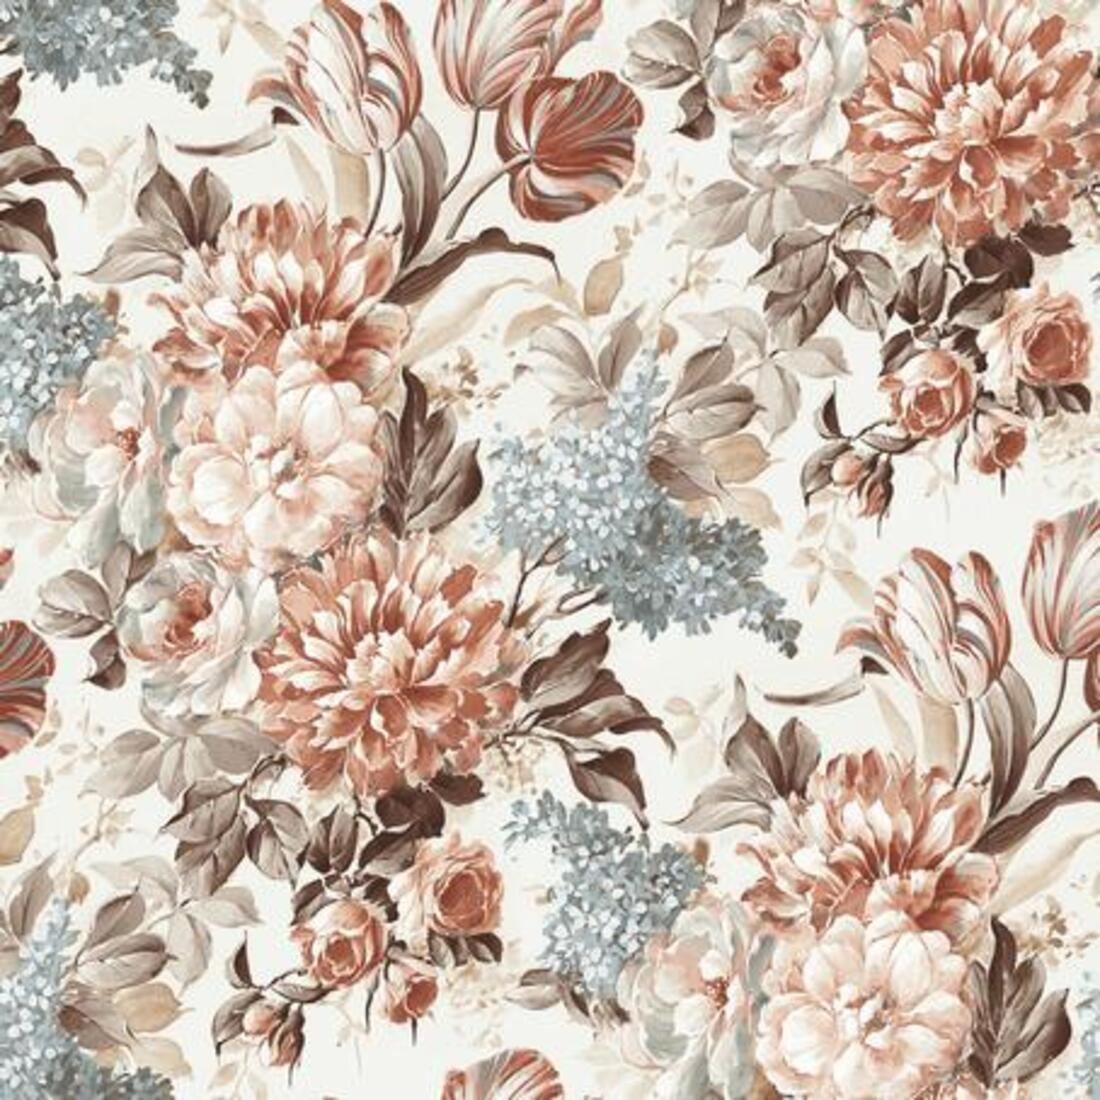 Меблева тканина Flowers Beige 55143/1018, велюр з принтом